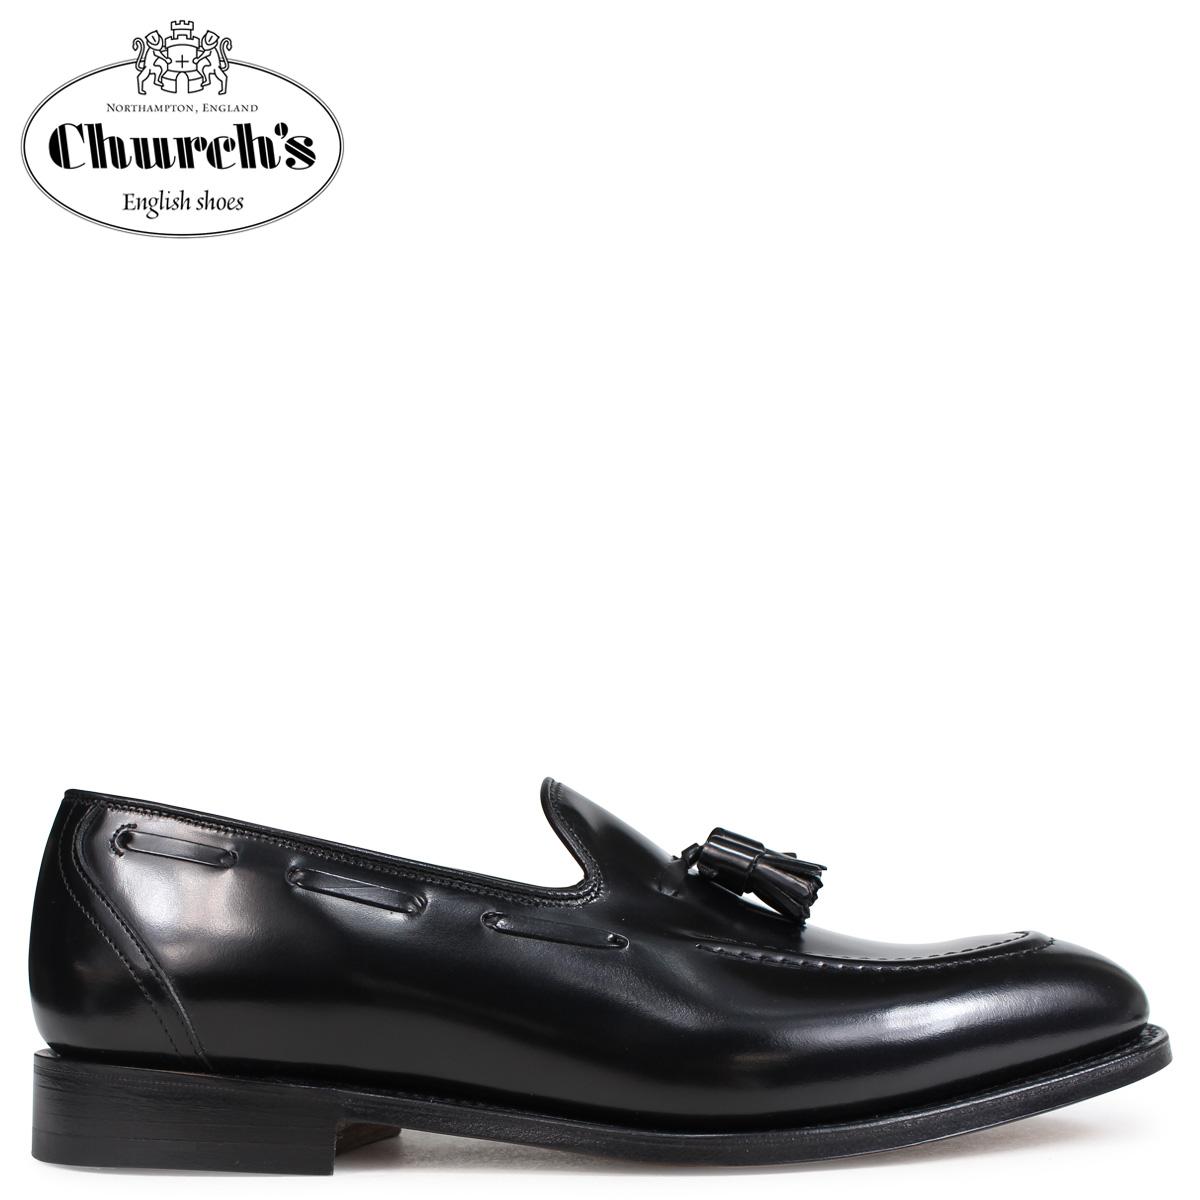 Churchs チャーチ 靴 キングスレー 2 ローファー メンズ タッセルローファー メンズ KINGSLEY 2 POLISHED BINDER EDB027 ブラック 黒